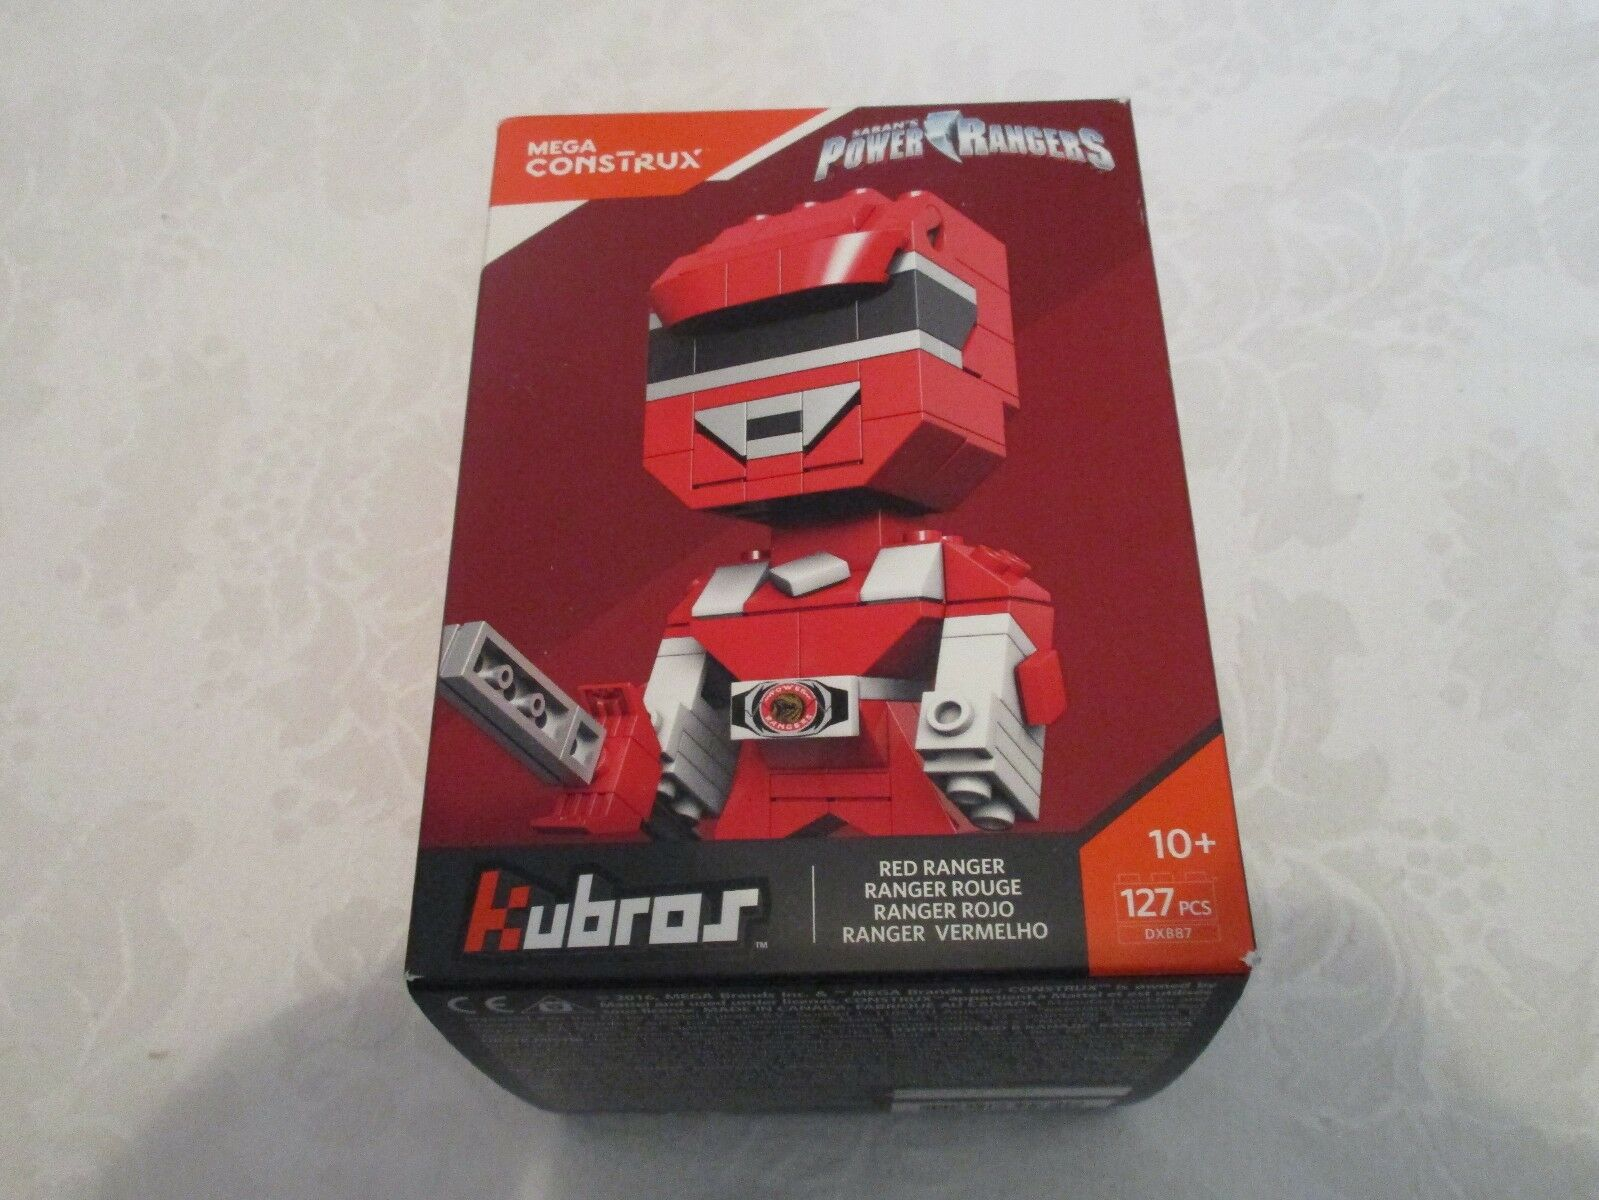 Kubros Mega Construx Not Movie Saban's Power Rangers rosso Ranger Toy Fair 2017